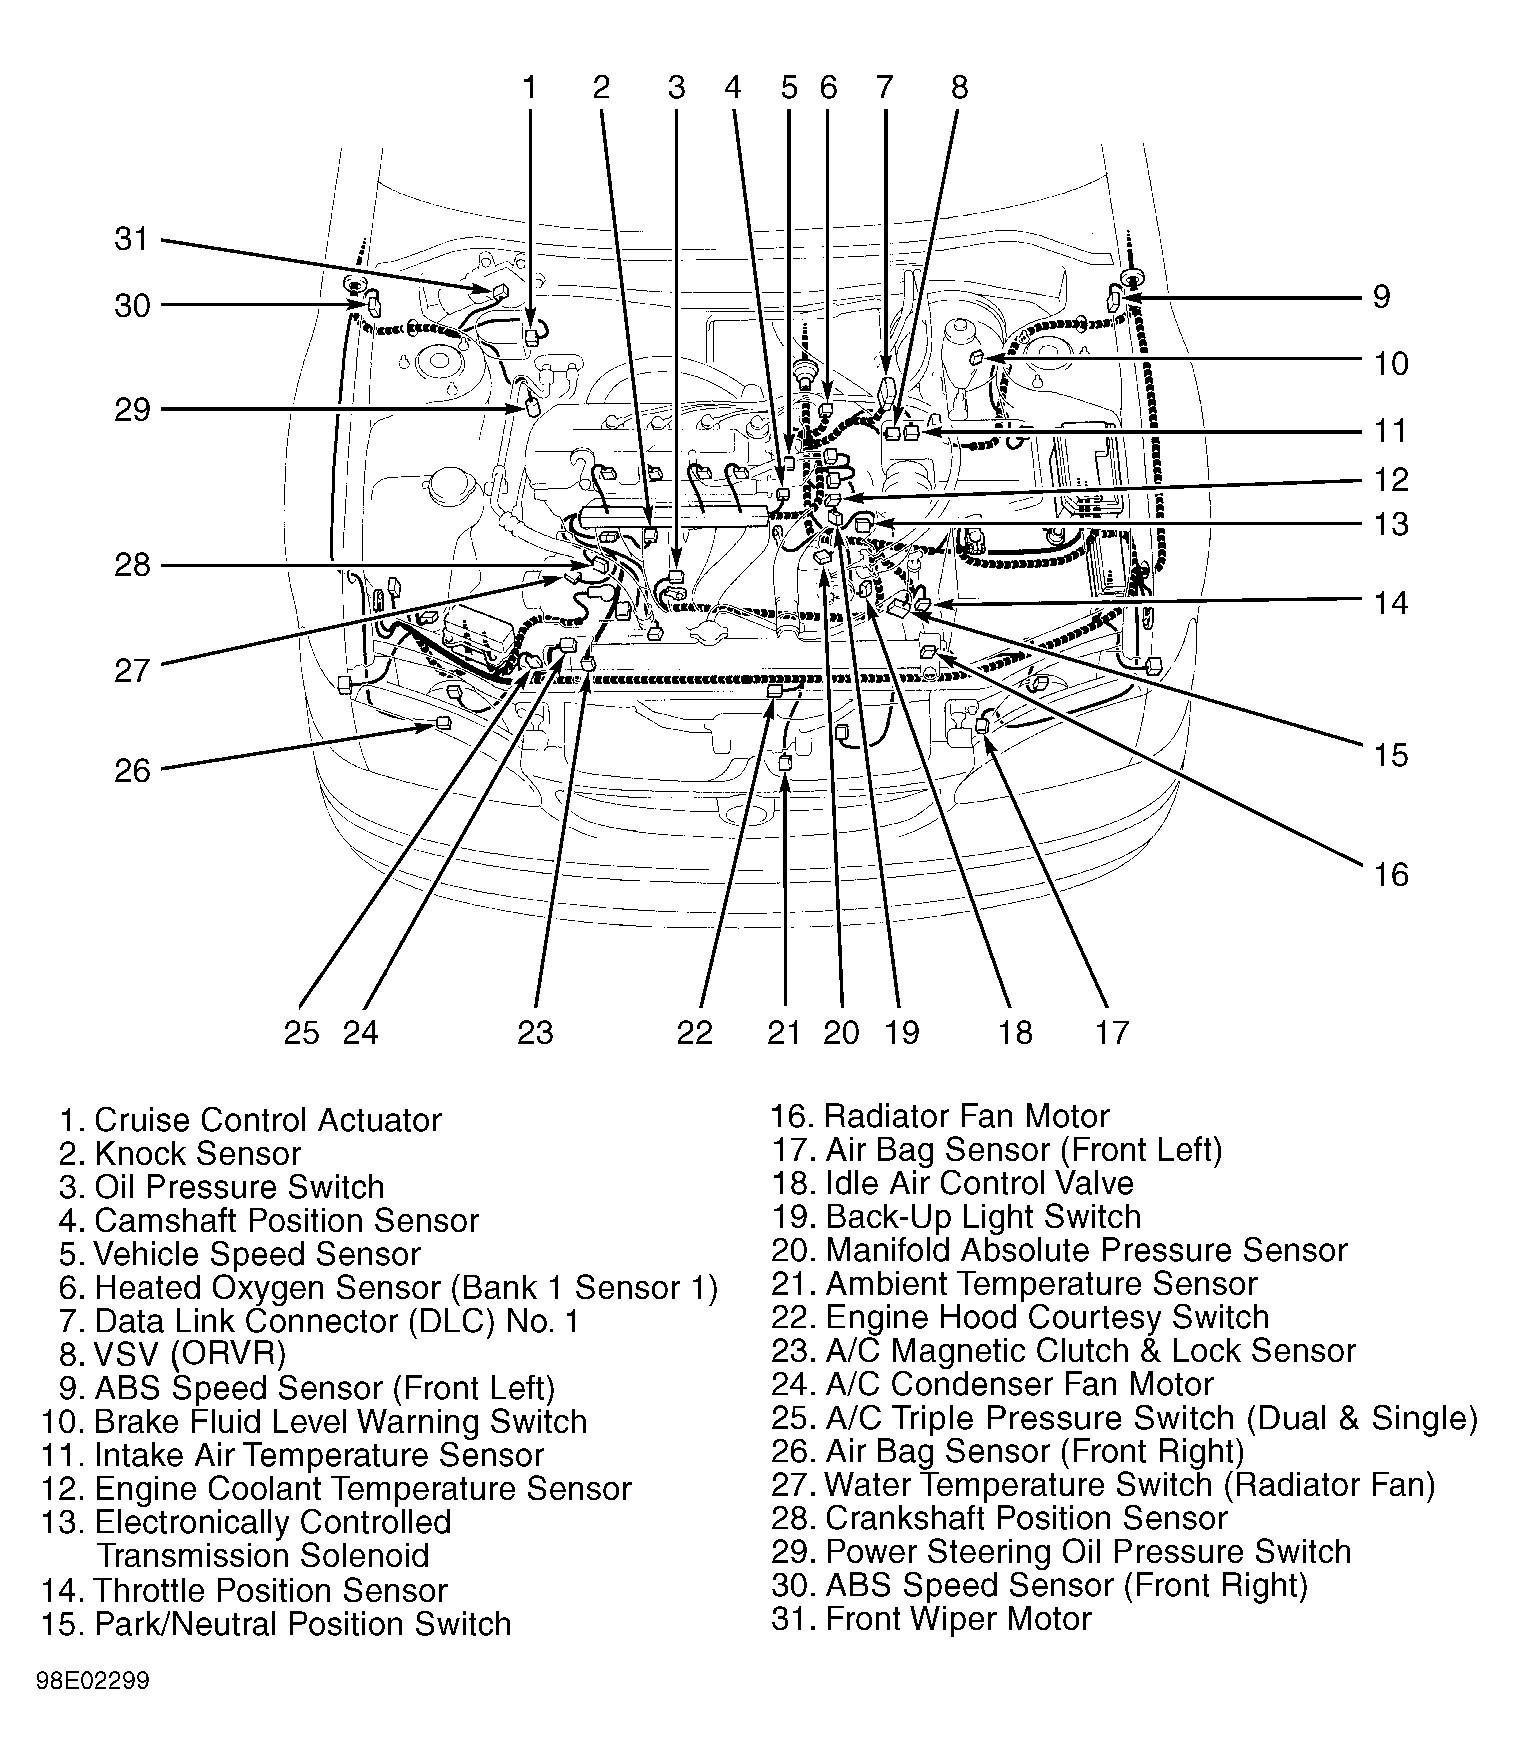 [DIAGRAM] 2003 Toyota Matrix Wiring Diagram Download